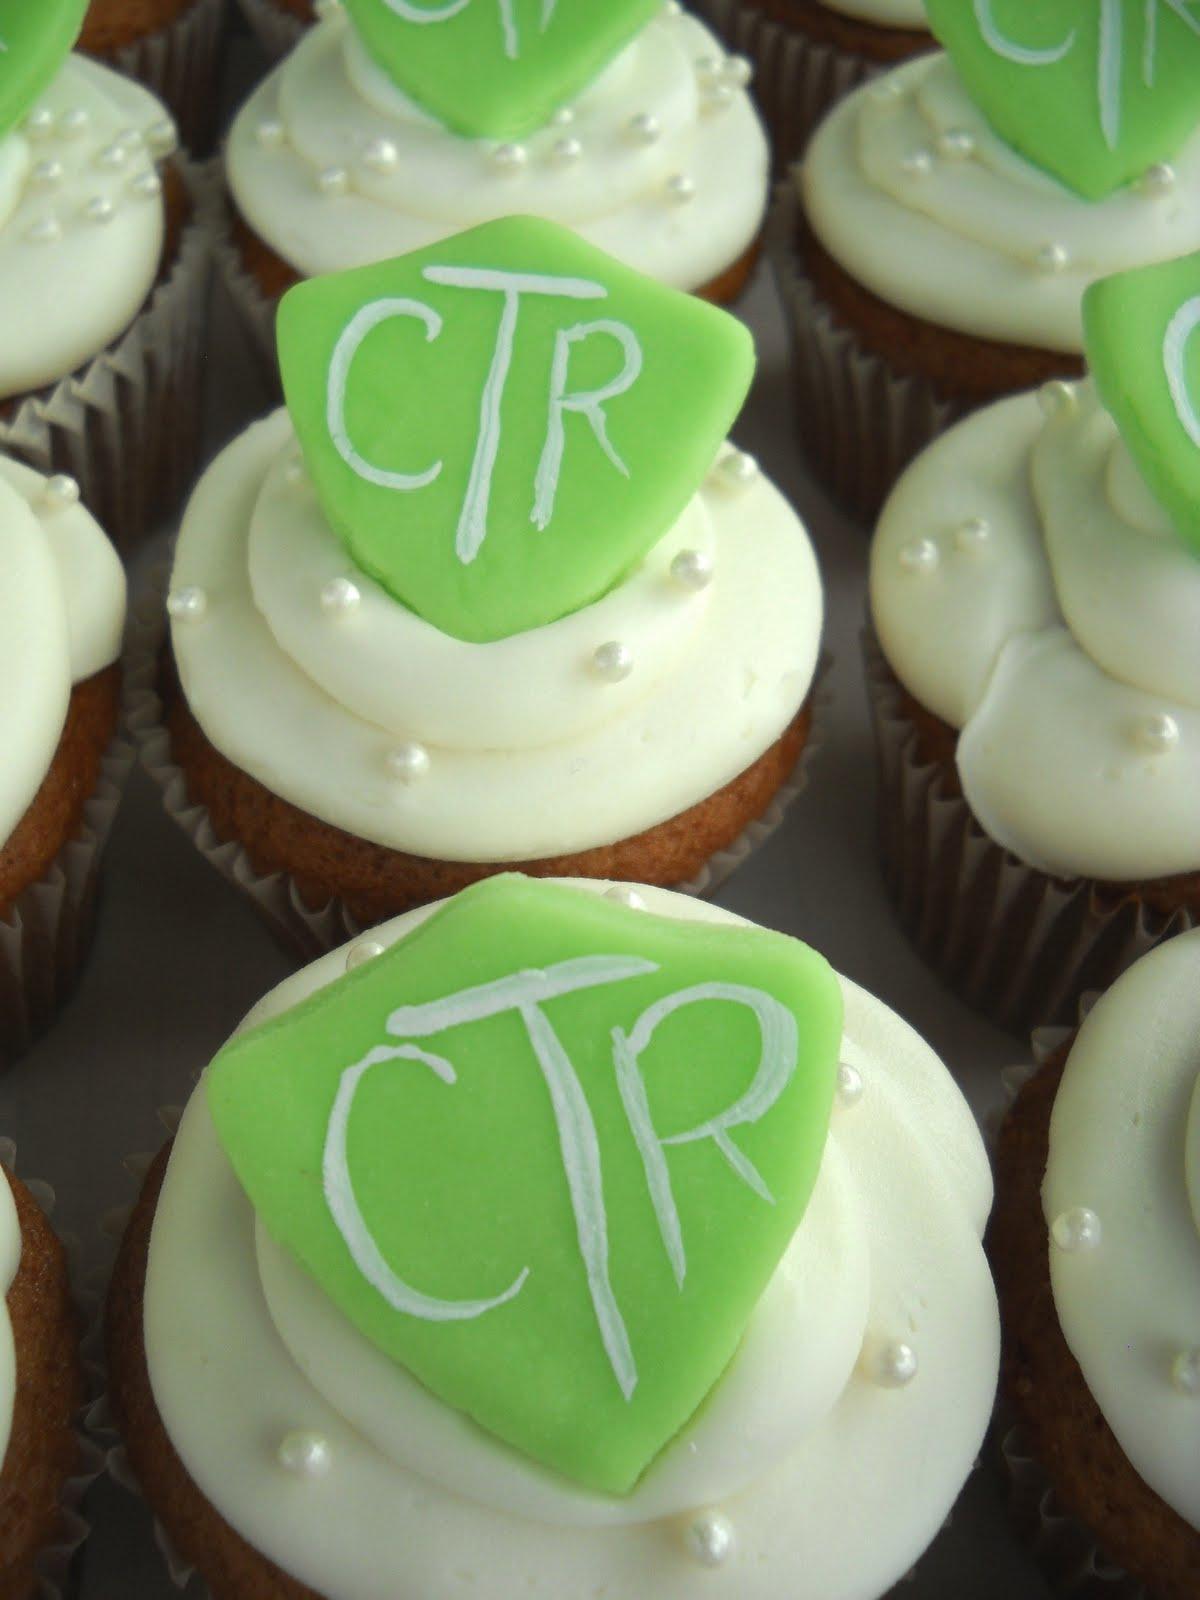 Violet S Custom Cakes Ctr Cupcakes